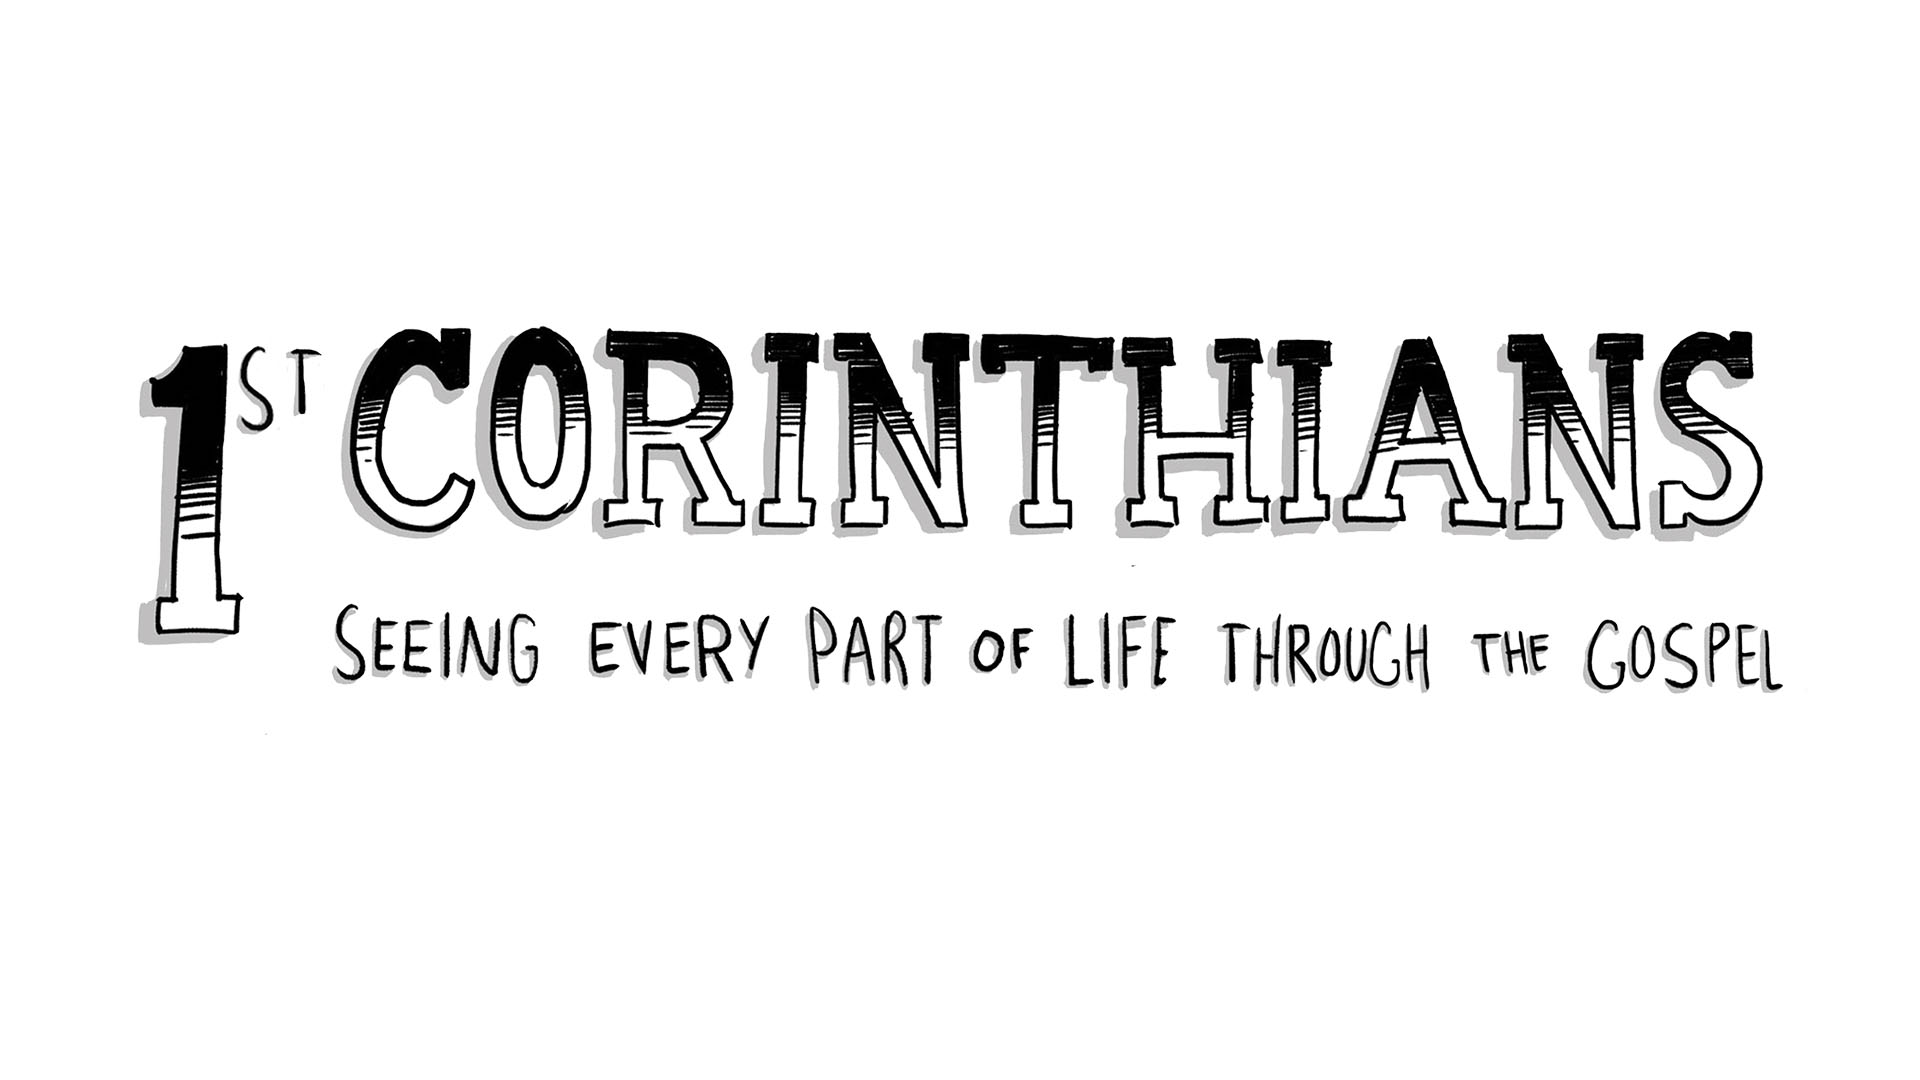 1st Corinthians.jpg